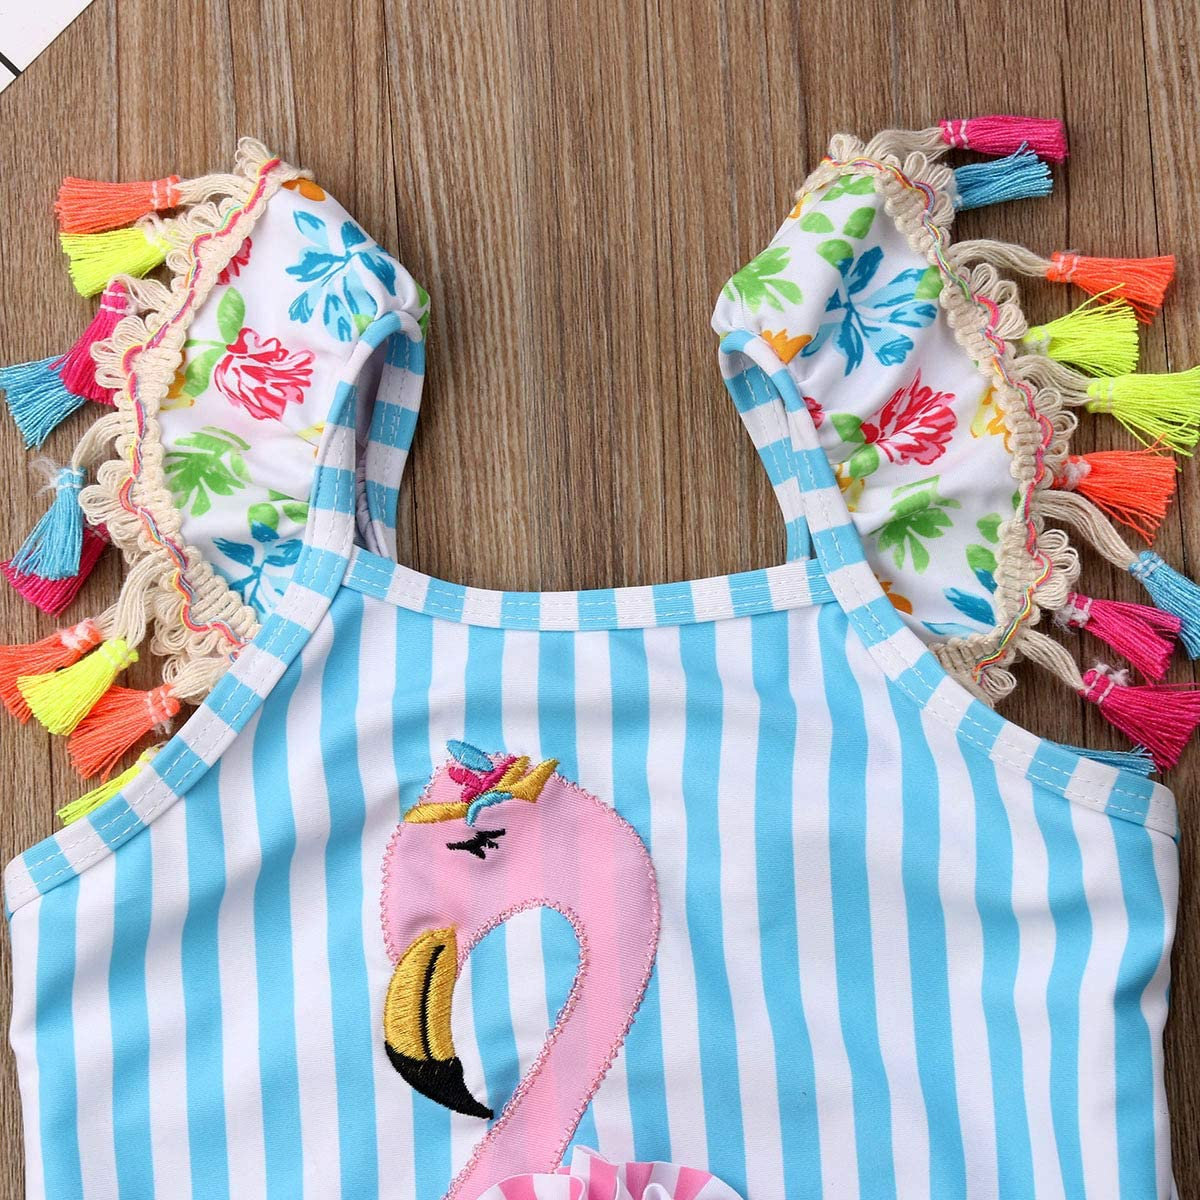 Baby Girl Ruffle Swimsuit One-Piece Bathing Suit Cute Parrot Bikini Toddler Swimwear Infant Beach Wear for Ages 0-24M